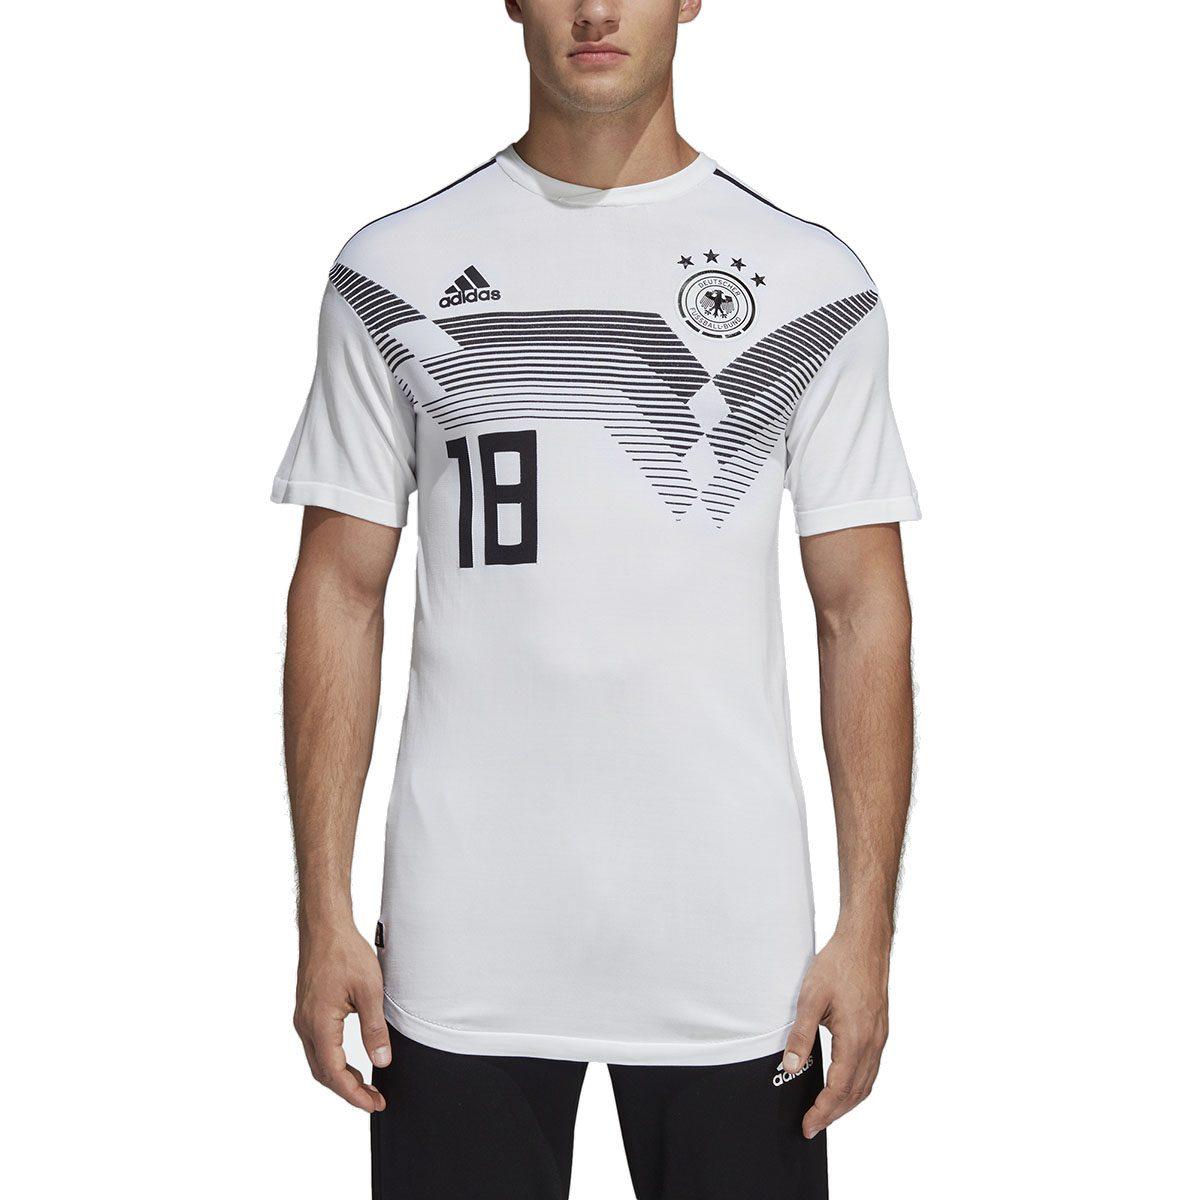 Adidas Soccer Men's Germany Home Jersey White Soccer Jersey CE8462 ...